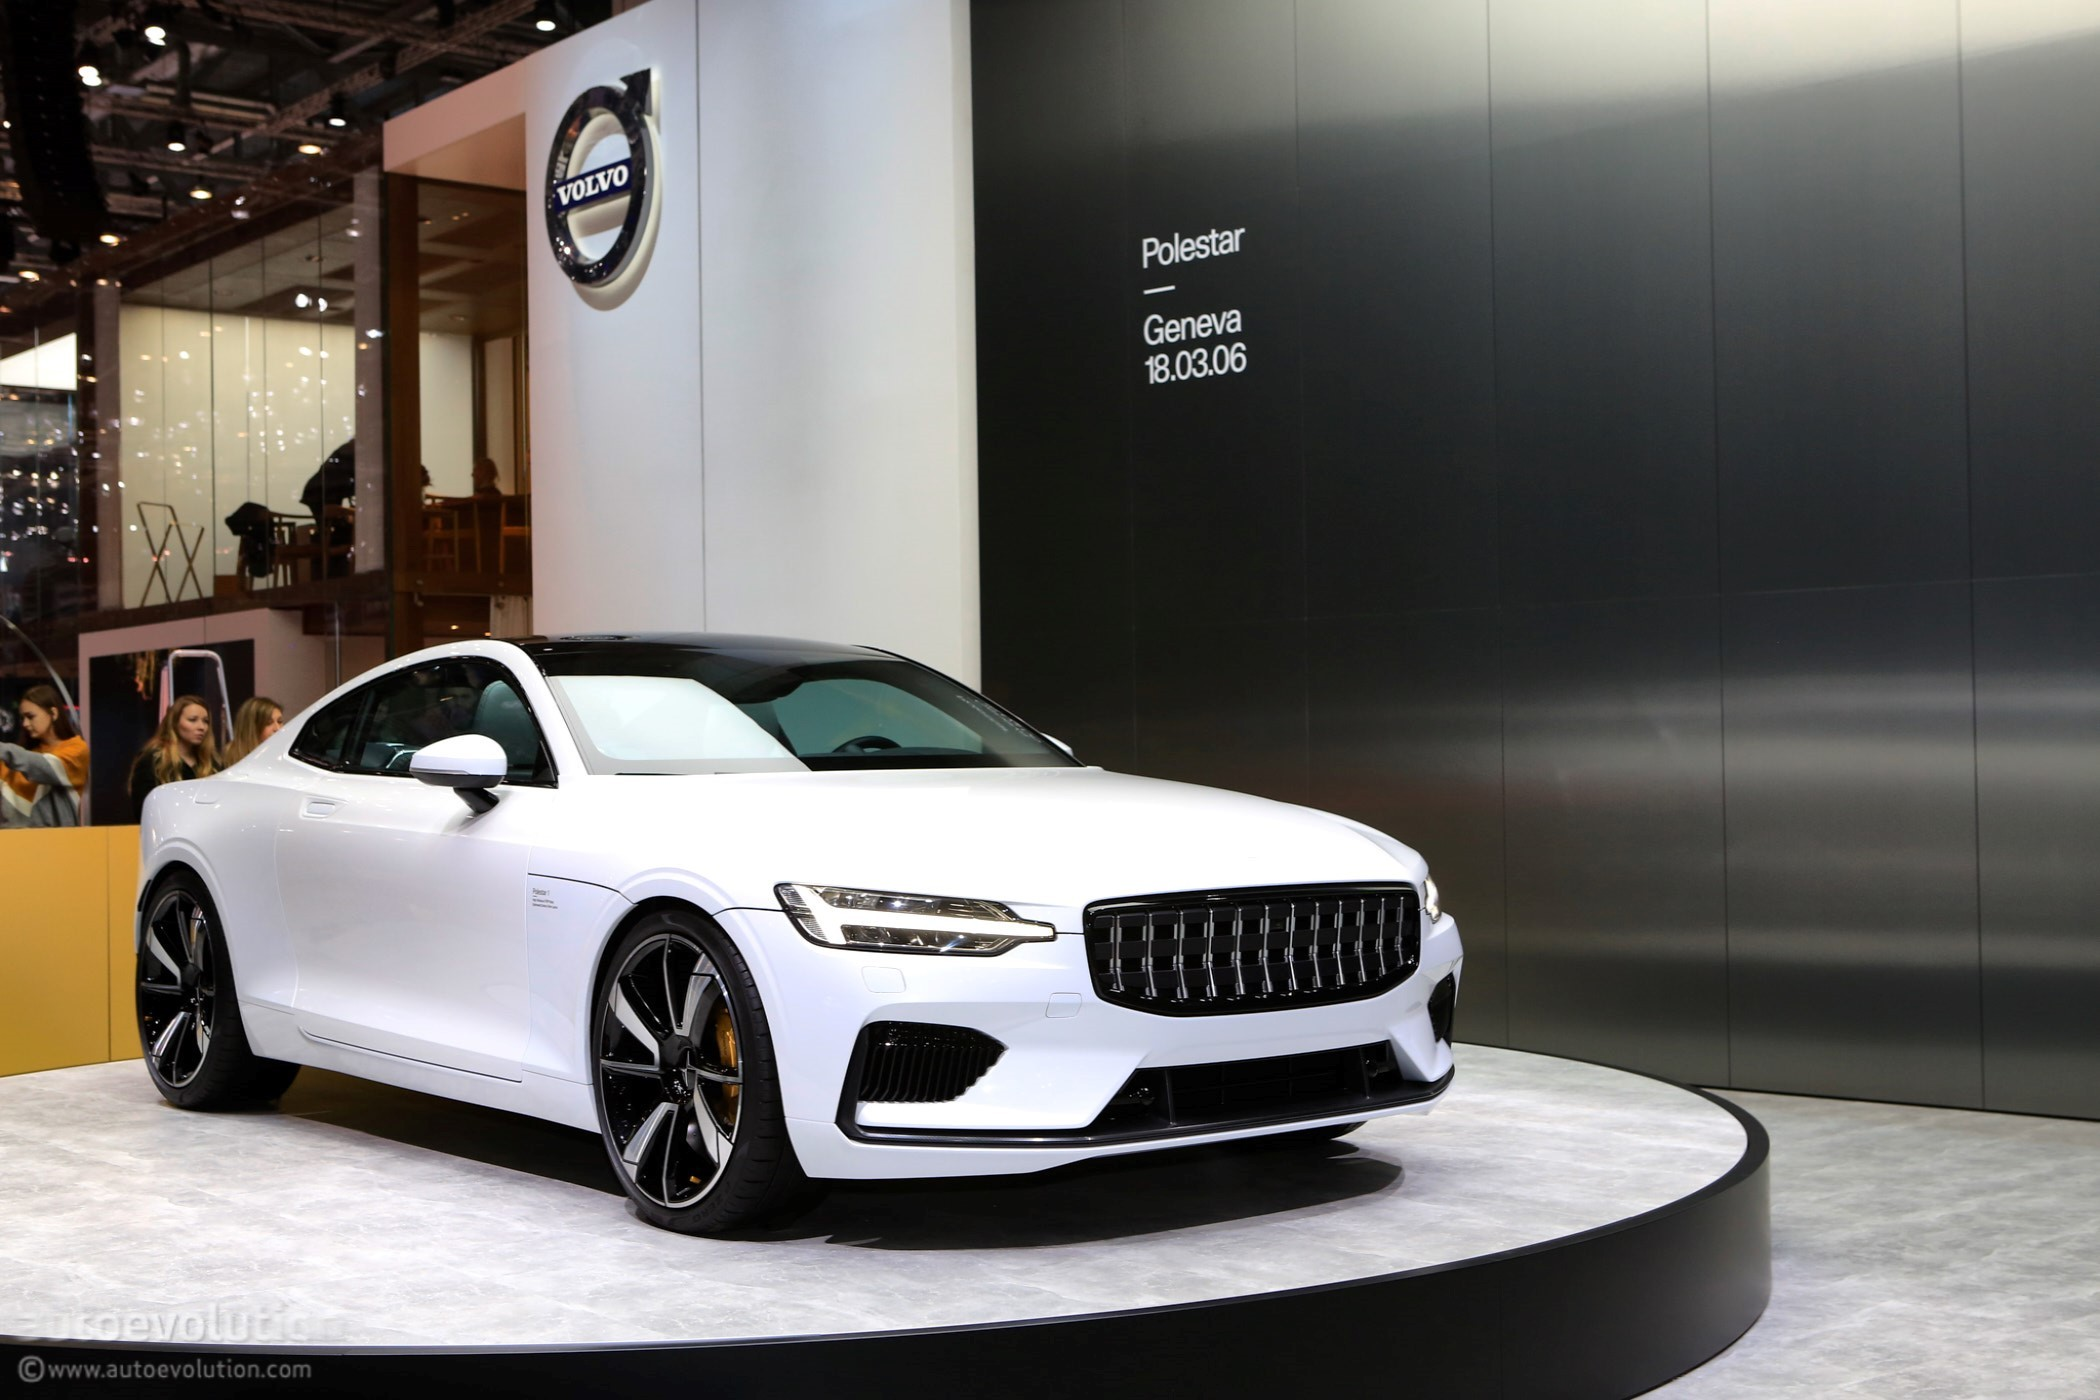 2019 Polestar 1 Shows Concept Like Design And Interior In These Videos Autoevolution